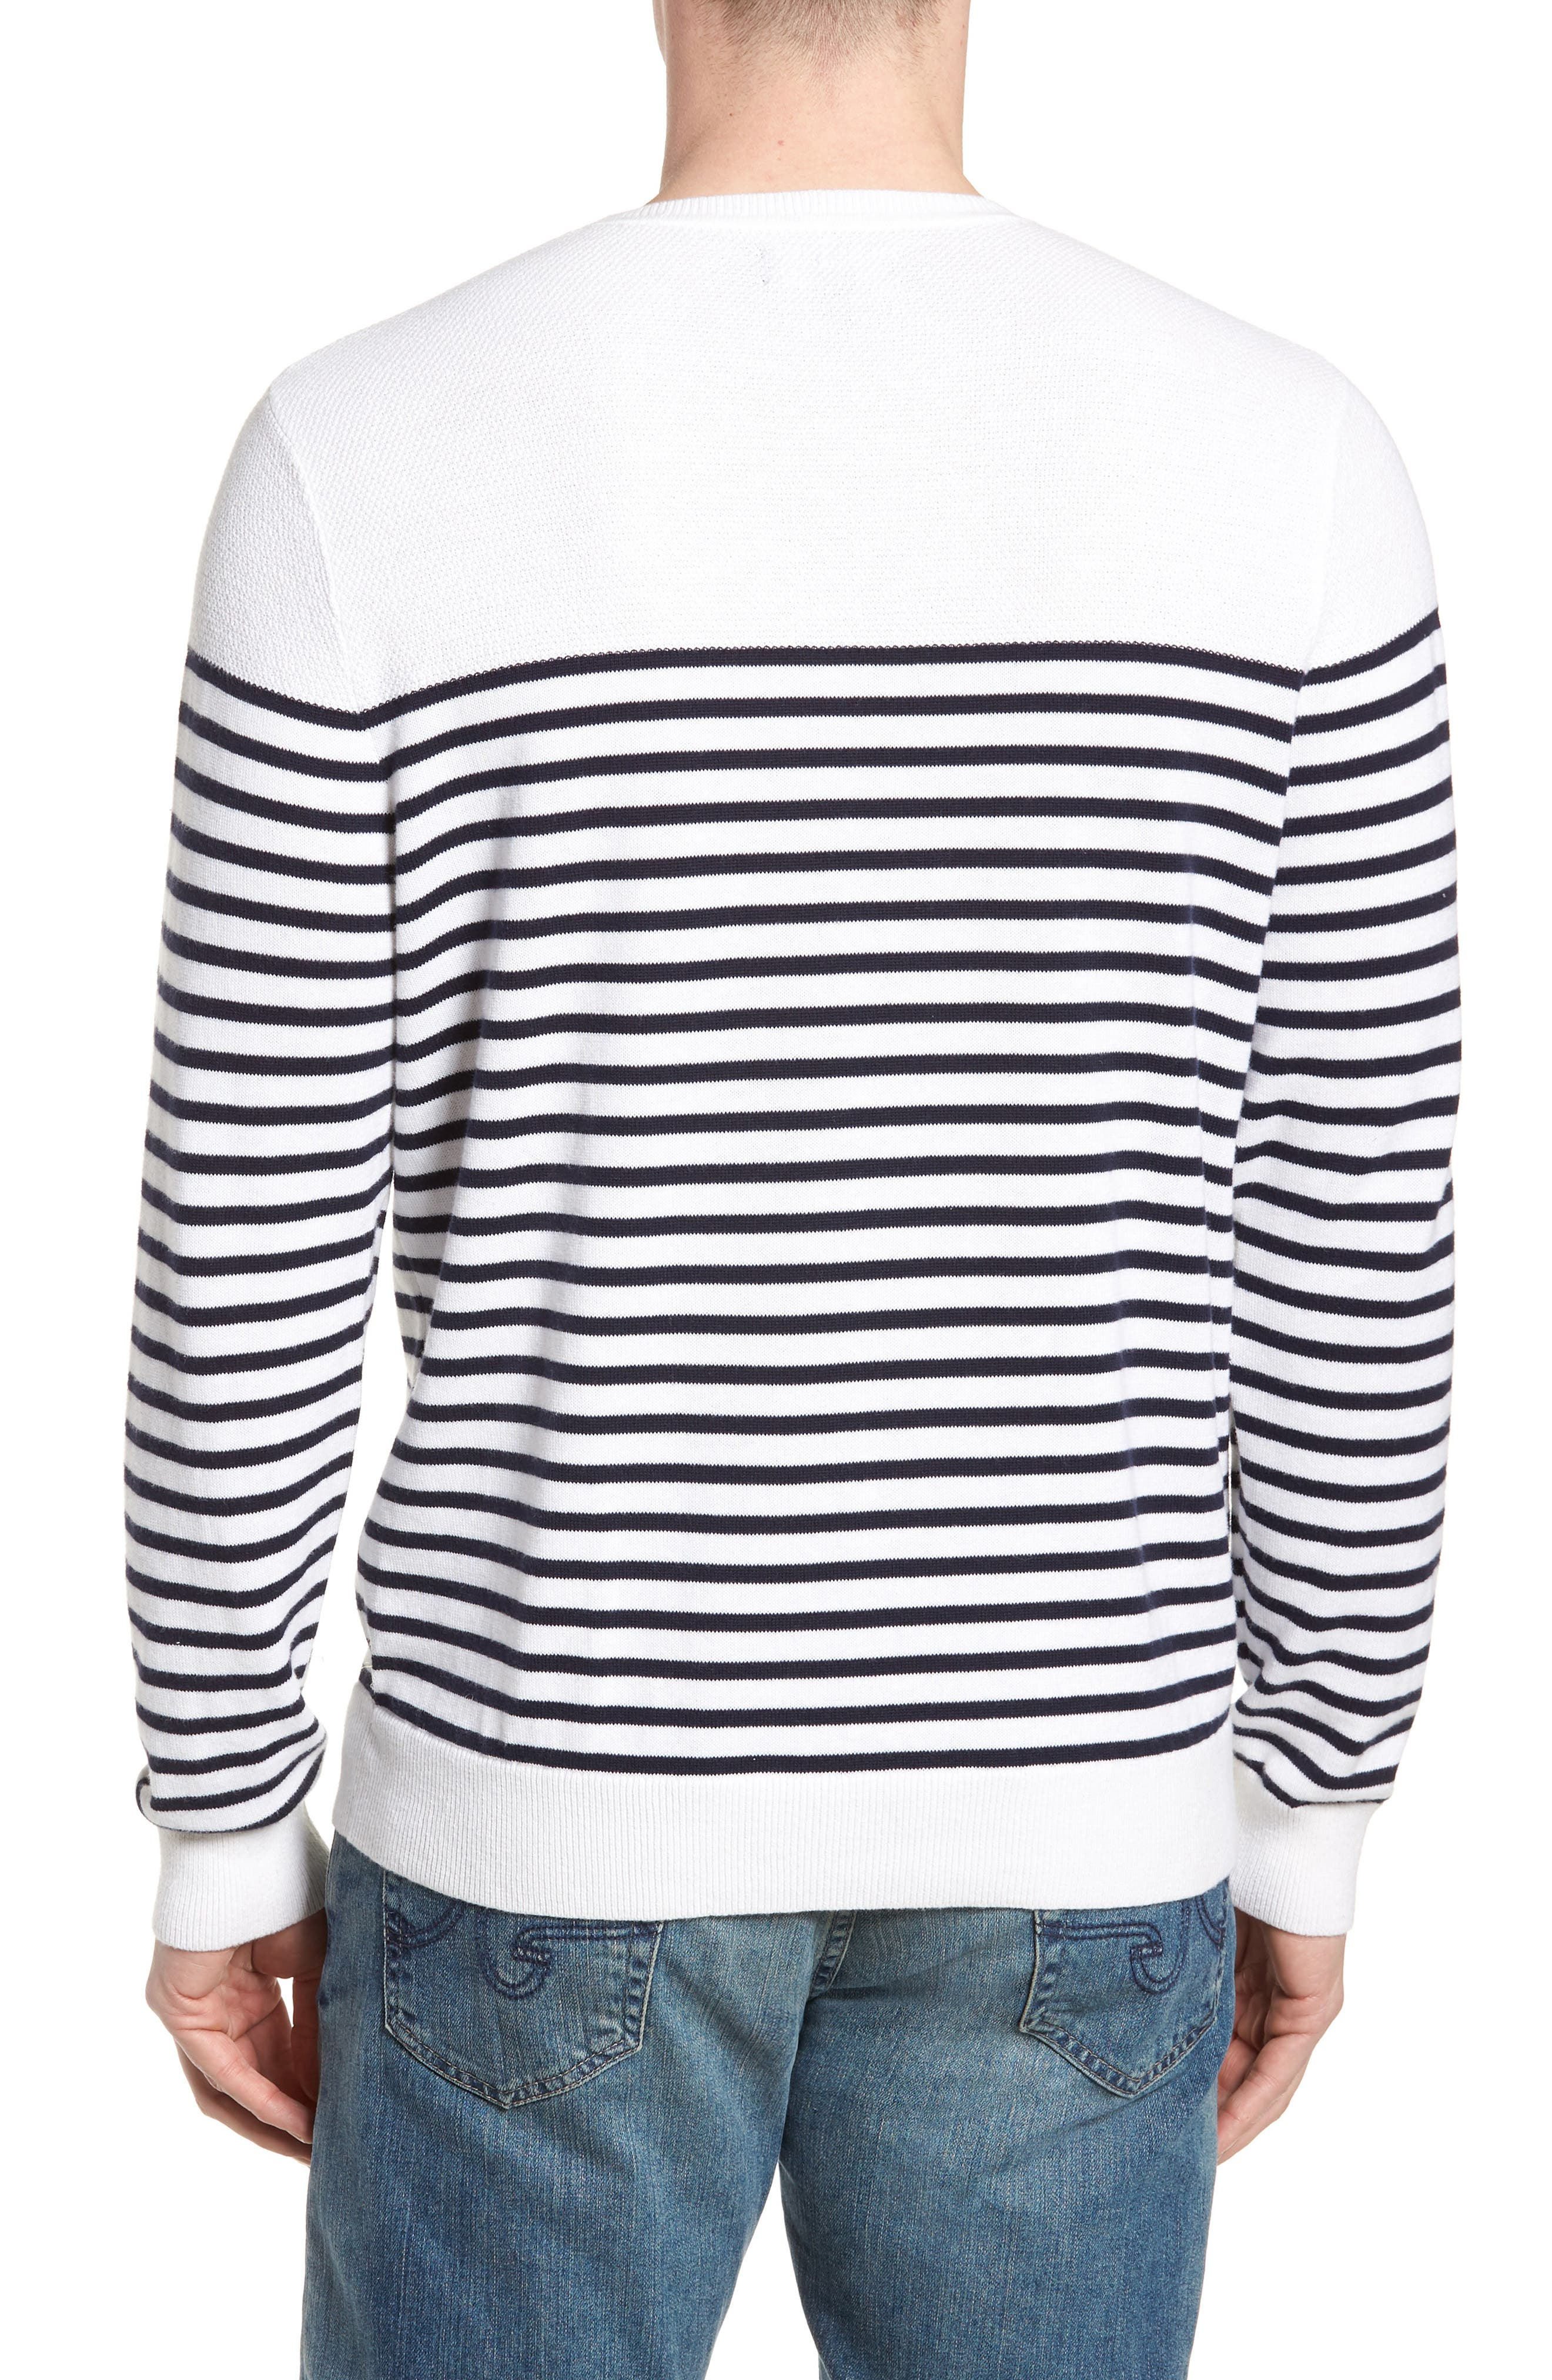 Breton Stripe Sweater,                             Alternate thumbnail 2, color,                             White Navy Stripe